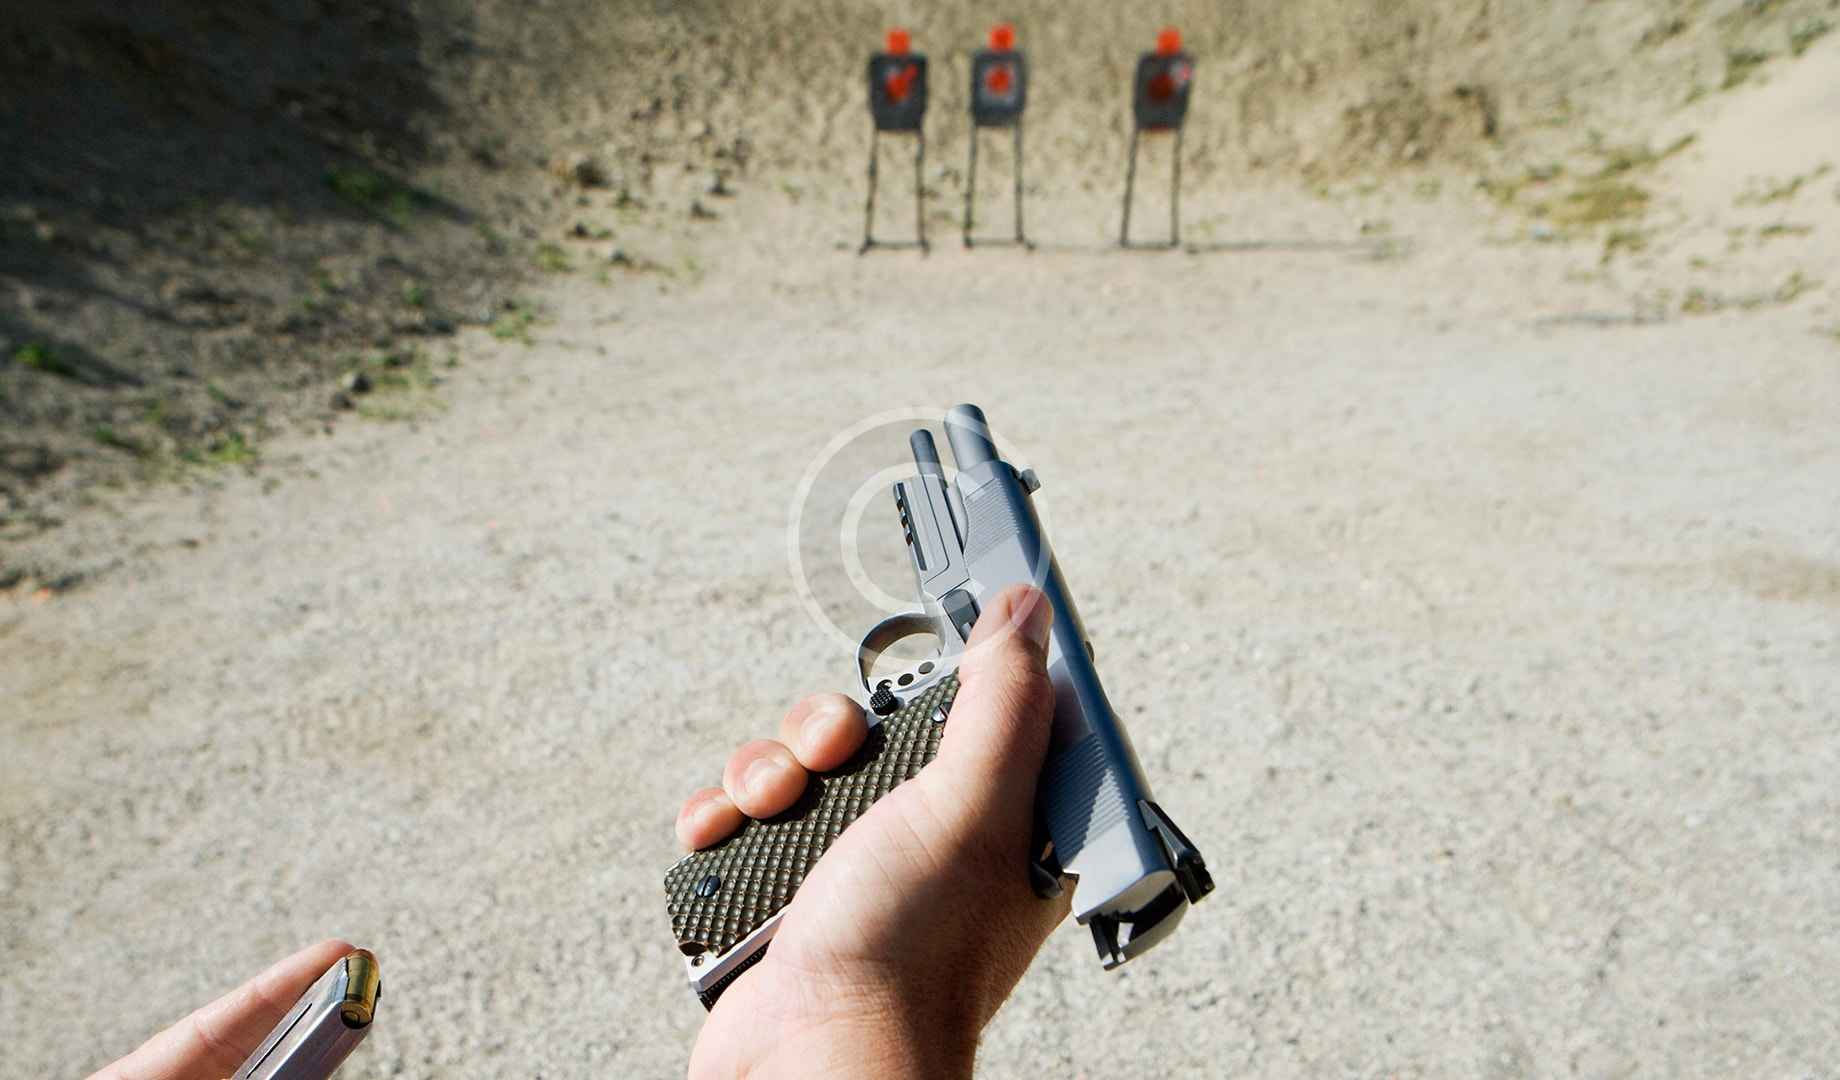 Range 1: Tactical Range